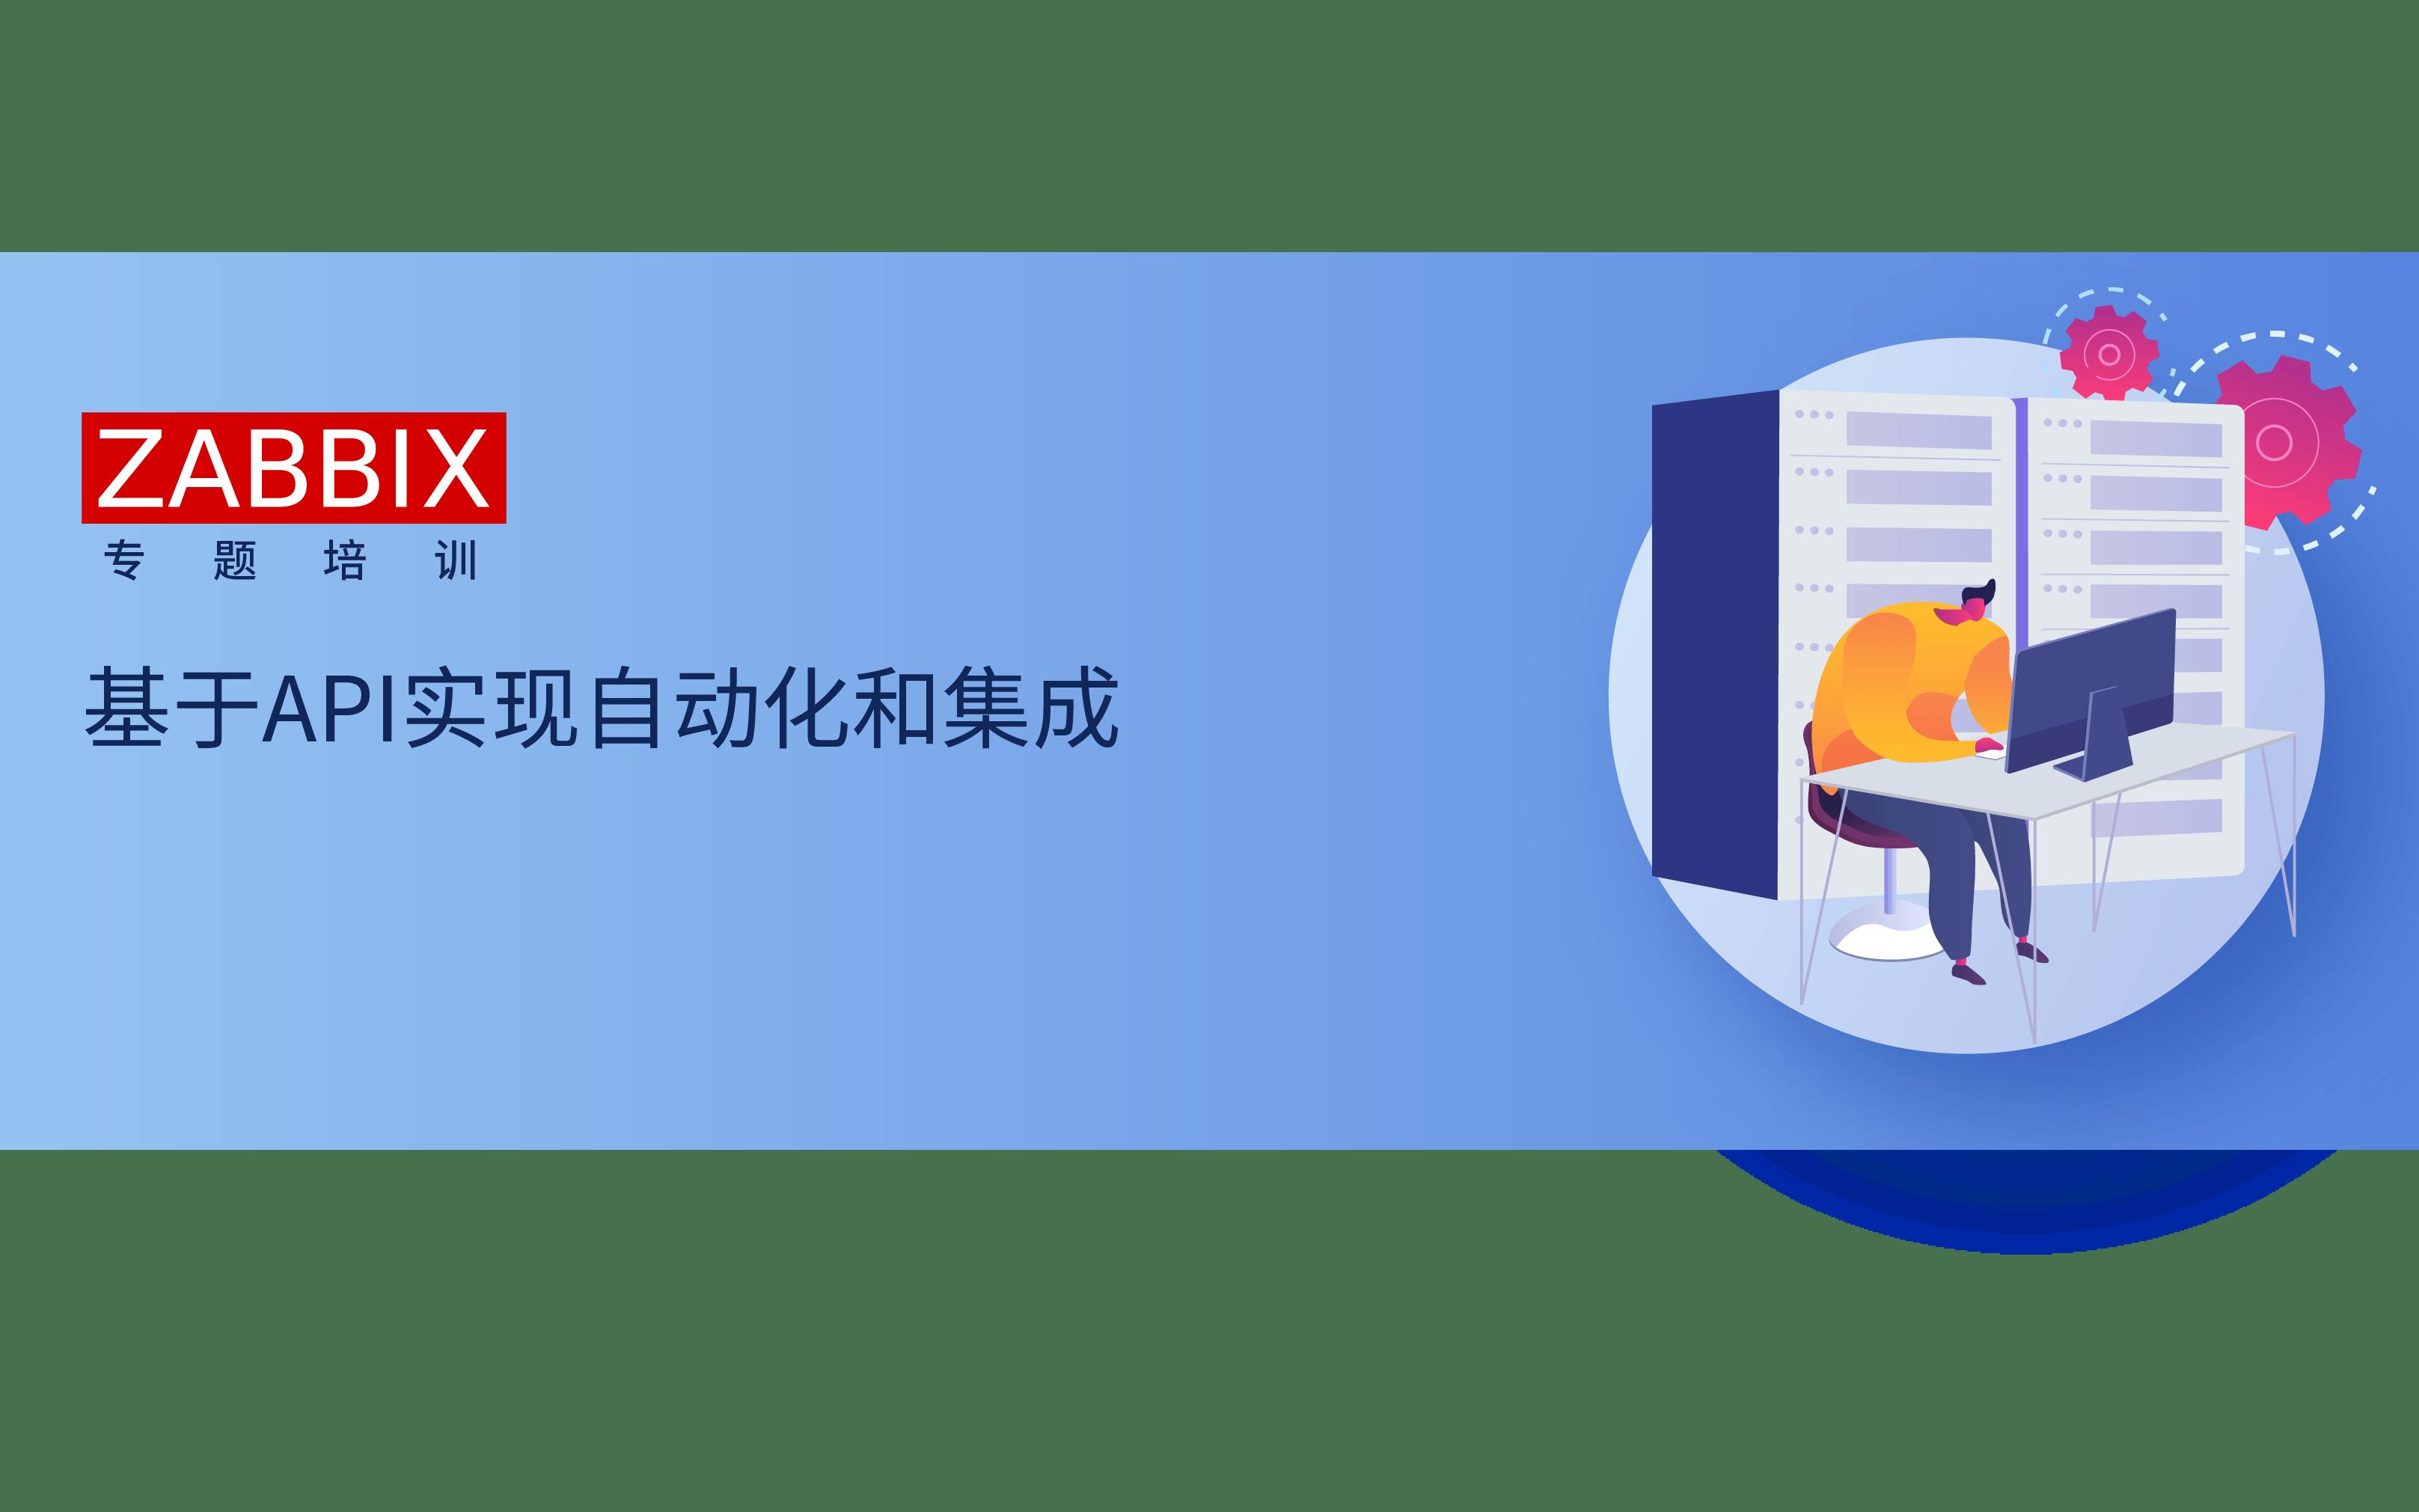 Zabbix专题培训:基于API实现自动化和集成